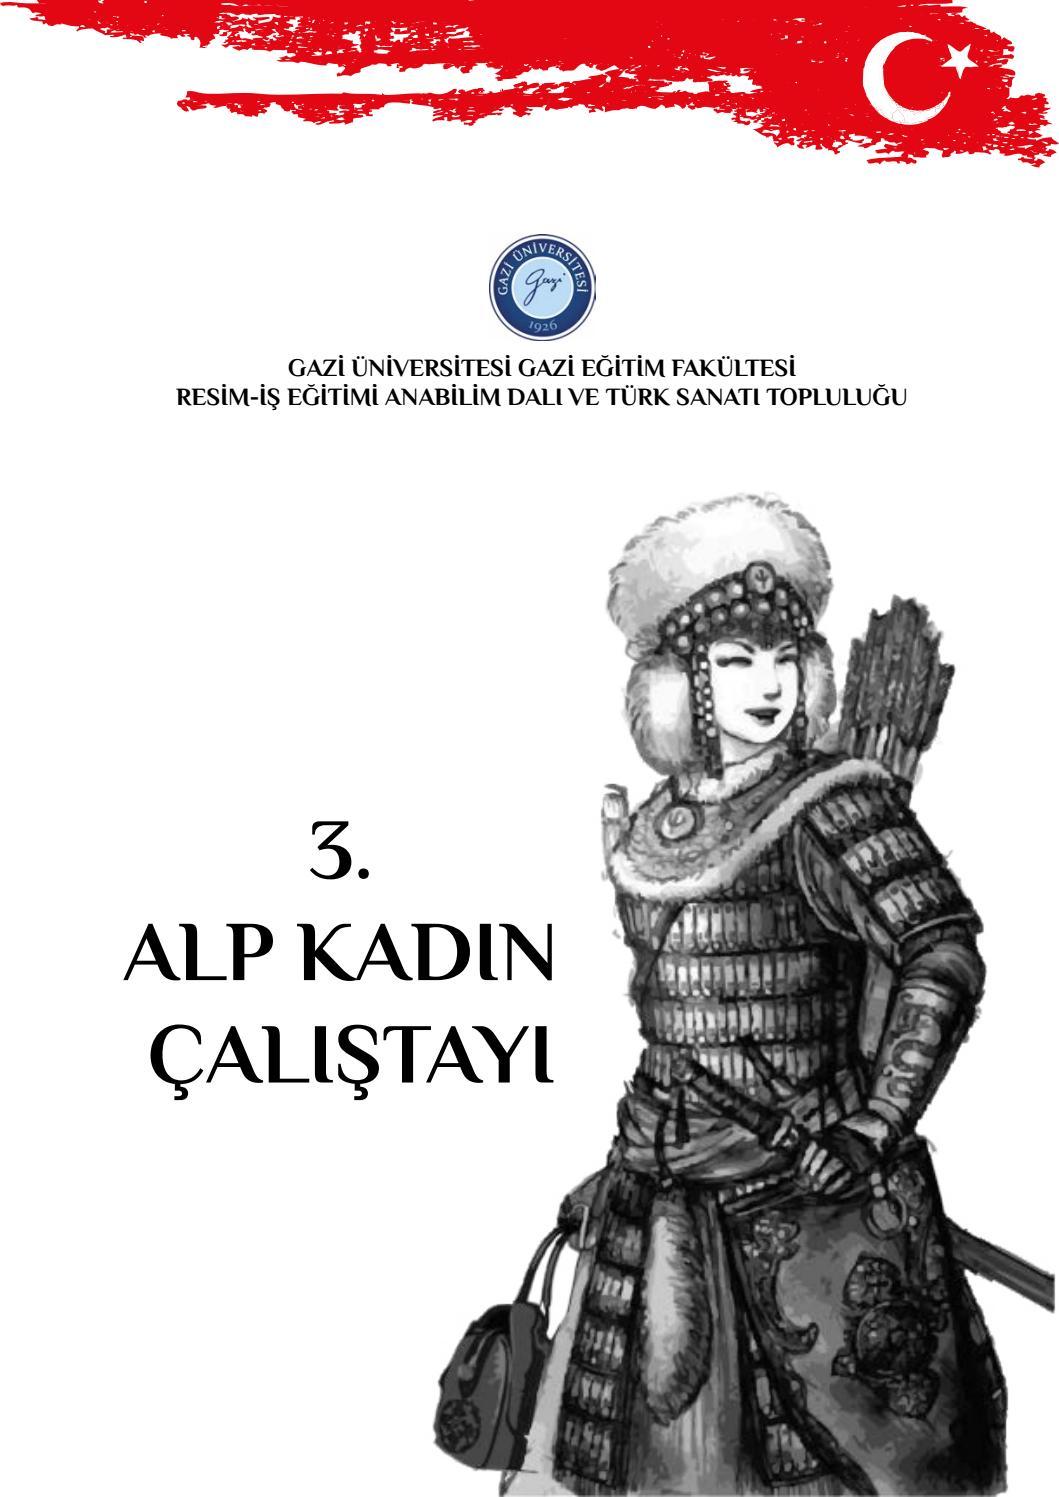 3 Alp Kadin Calistayi By G U Gazi Egitim Fakultesi Resim Is Abd